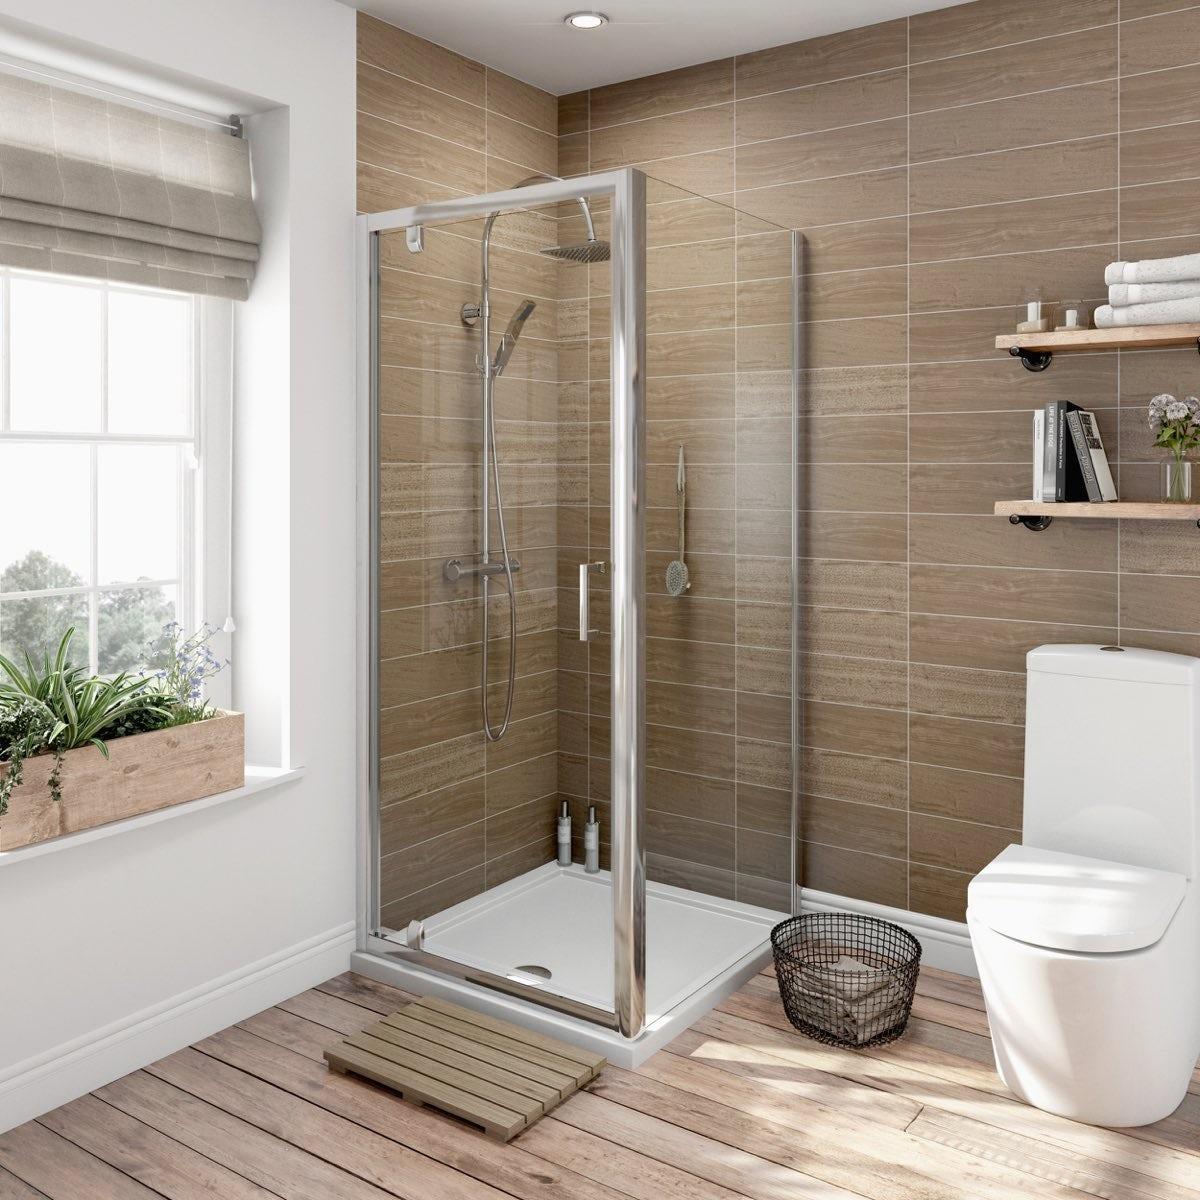 Orchard 6mm pivot door rectangular shower enclosure 900 x 760